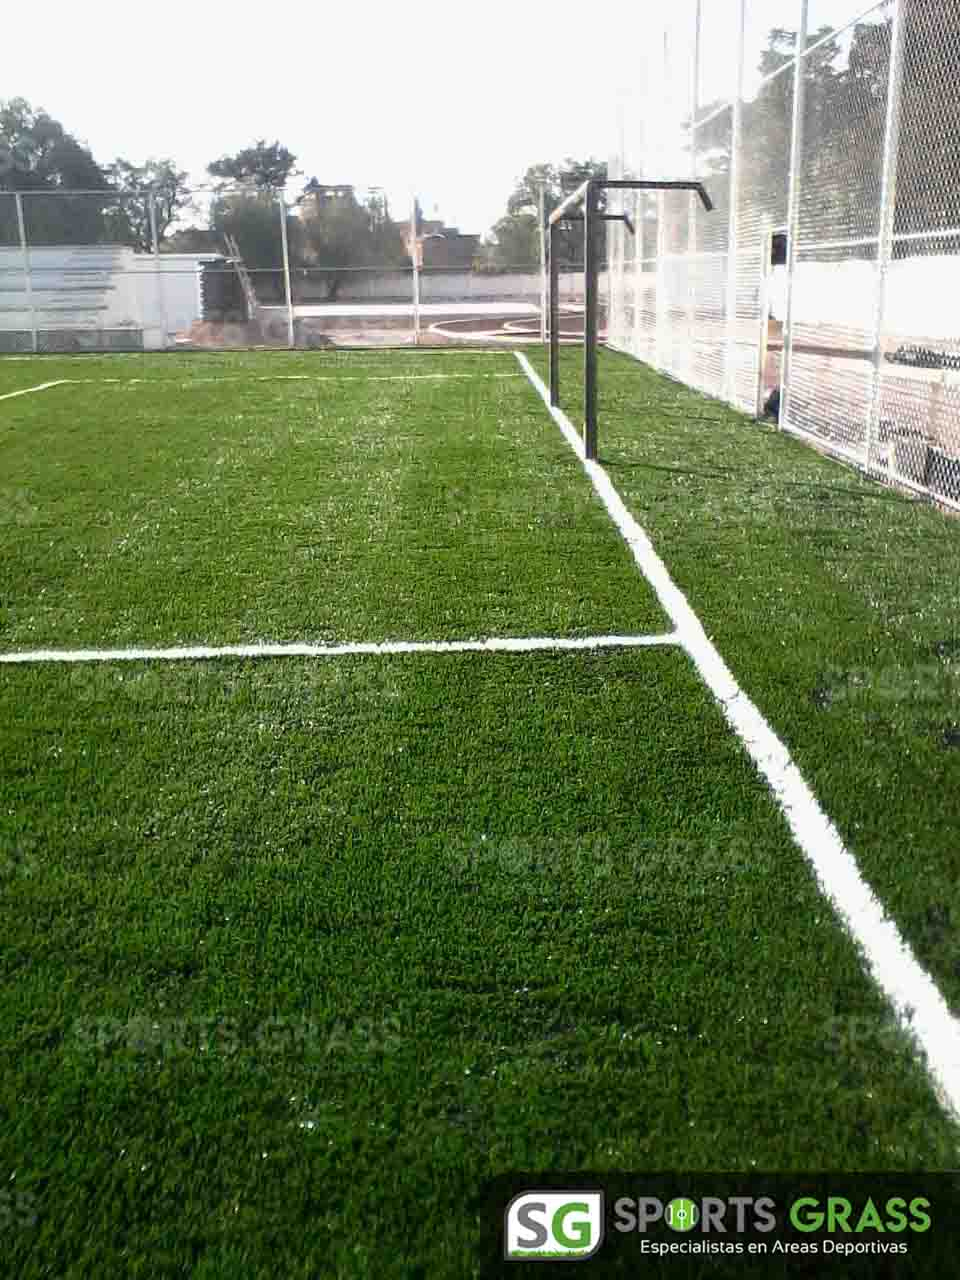 Cancha Futbol 7 Apaseo el Alto Guanajuato Sports Grass 04